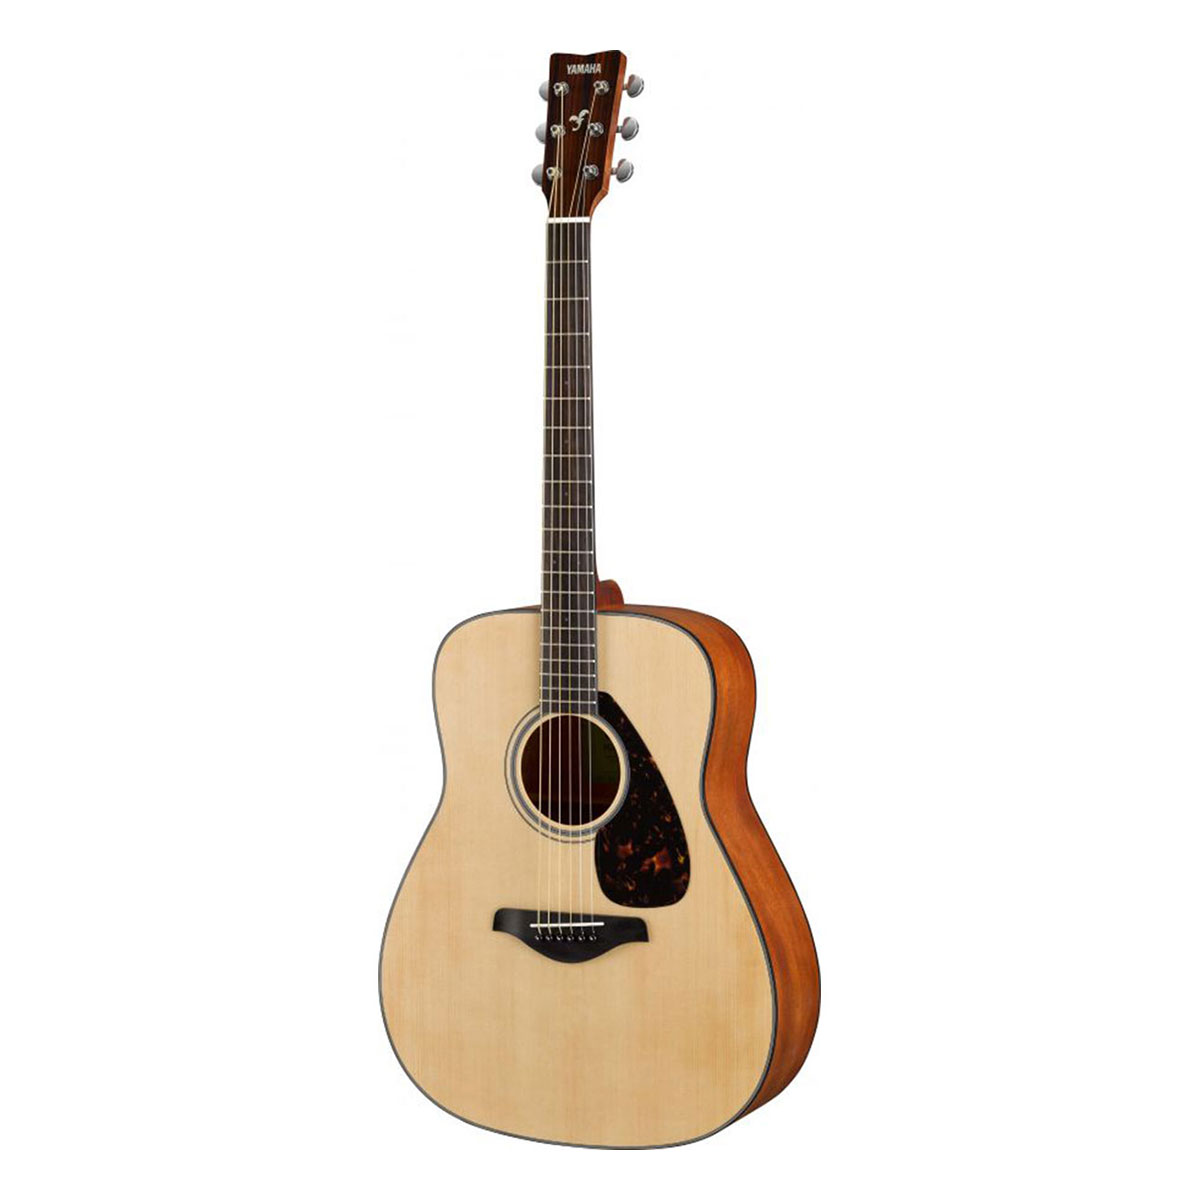 Yamaha - GFG800MNT natural matte - guitare folk T